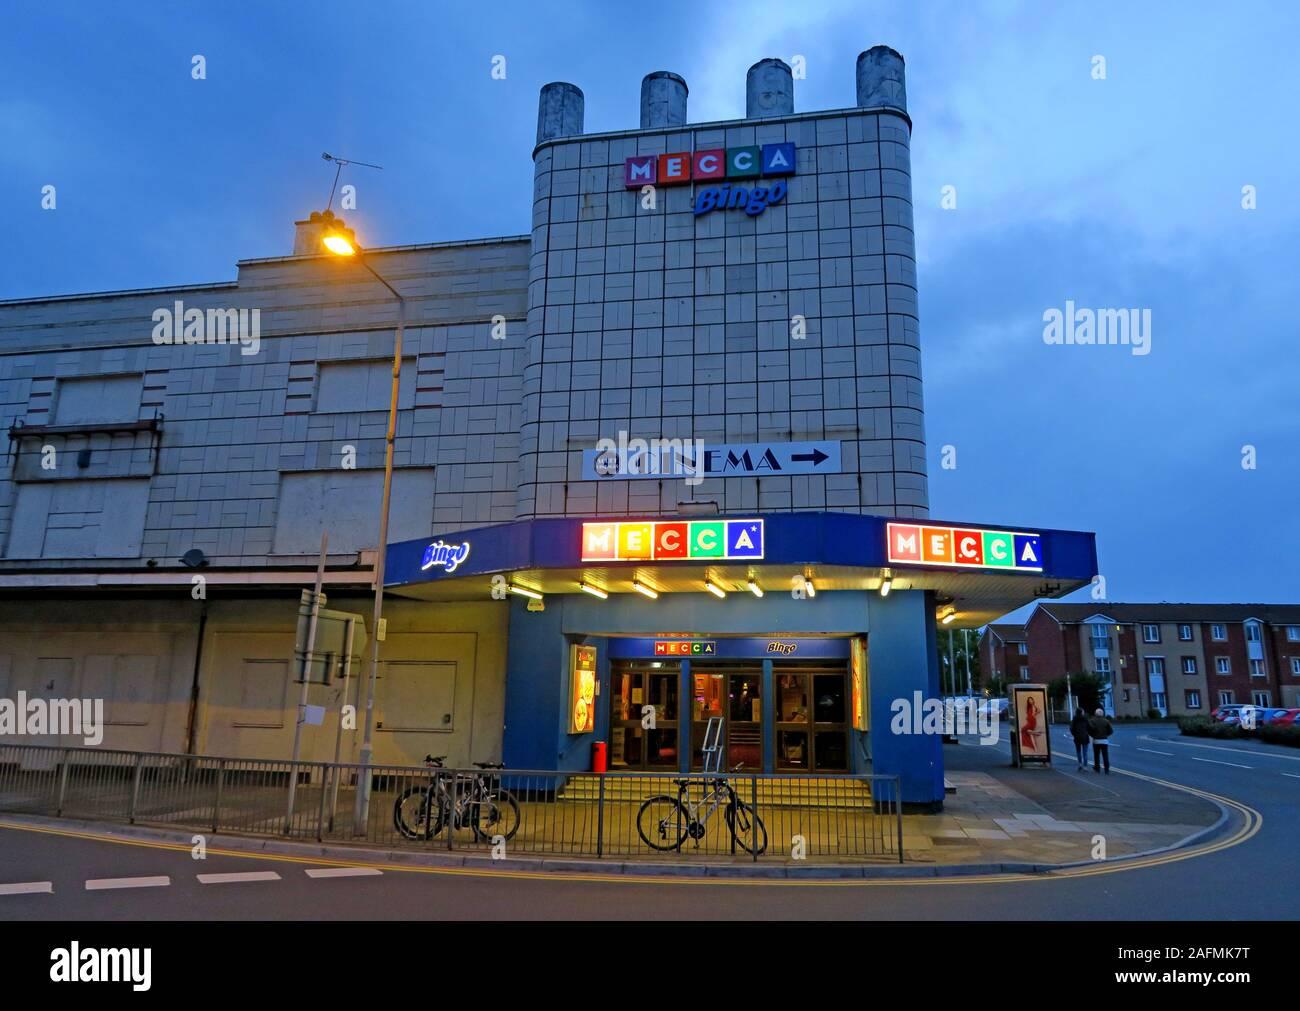 HotpixUK,@HotpixUK,GoTonySmith,Somerset,SDC,Sedgemoor,Sedgemoor District Council,South West England,England,UK,South West,town,night,Bridgwater TA6 3PH,with,bingo,gamble,gambling